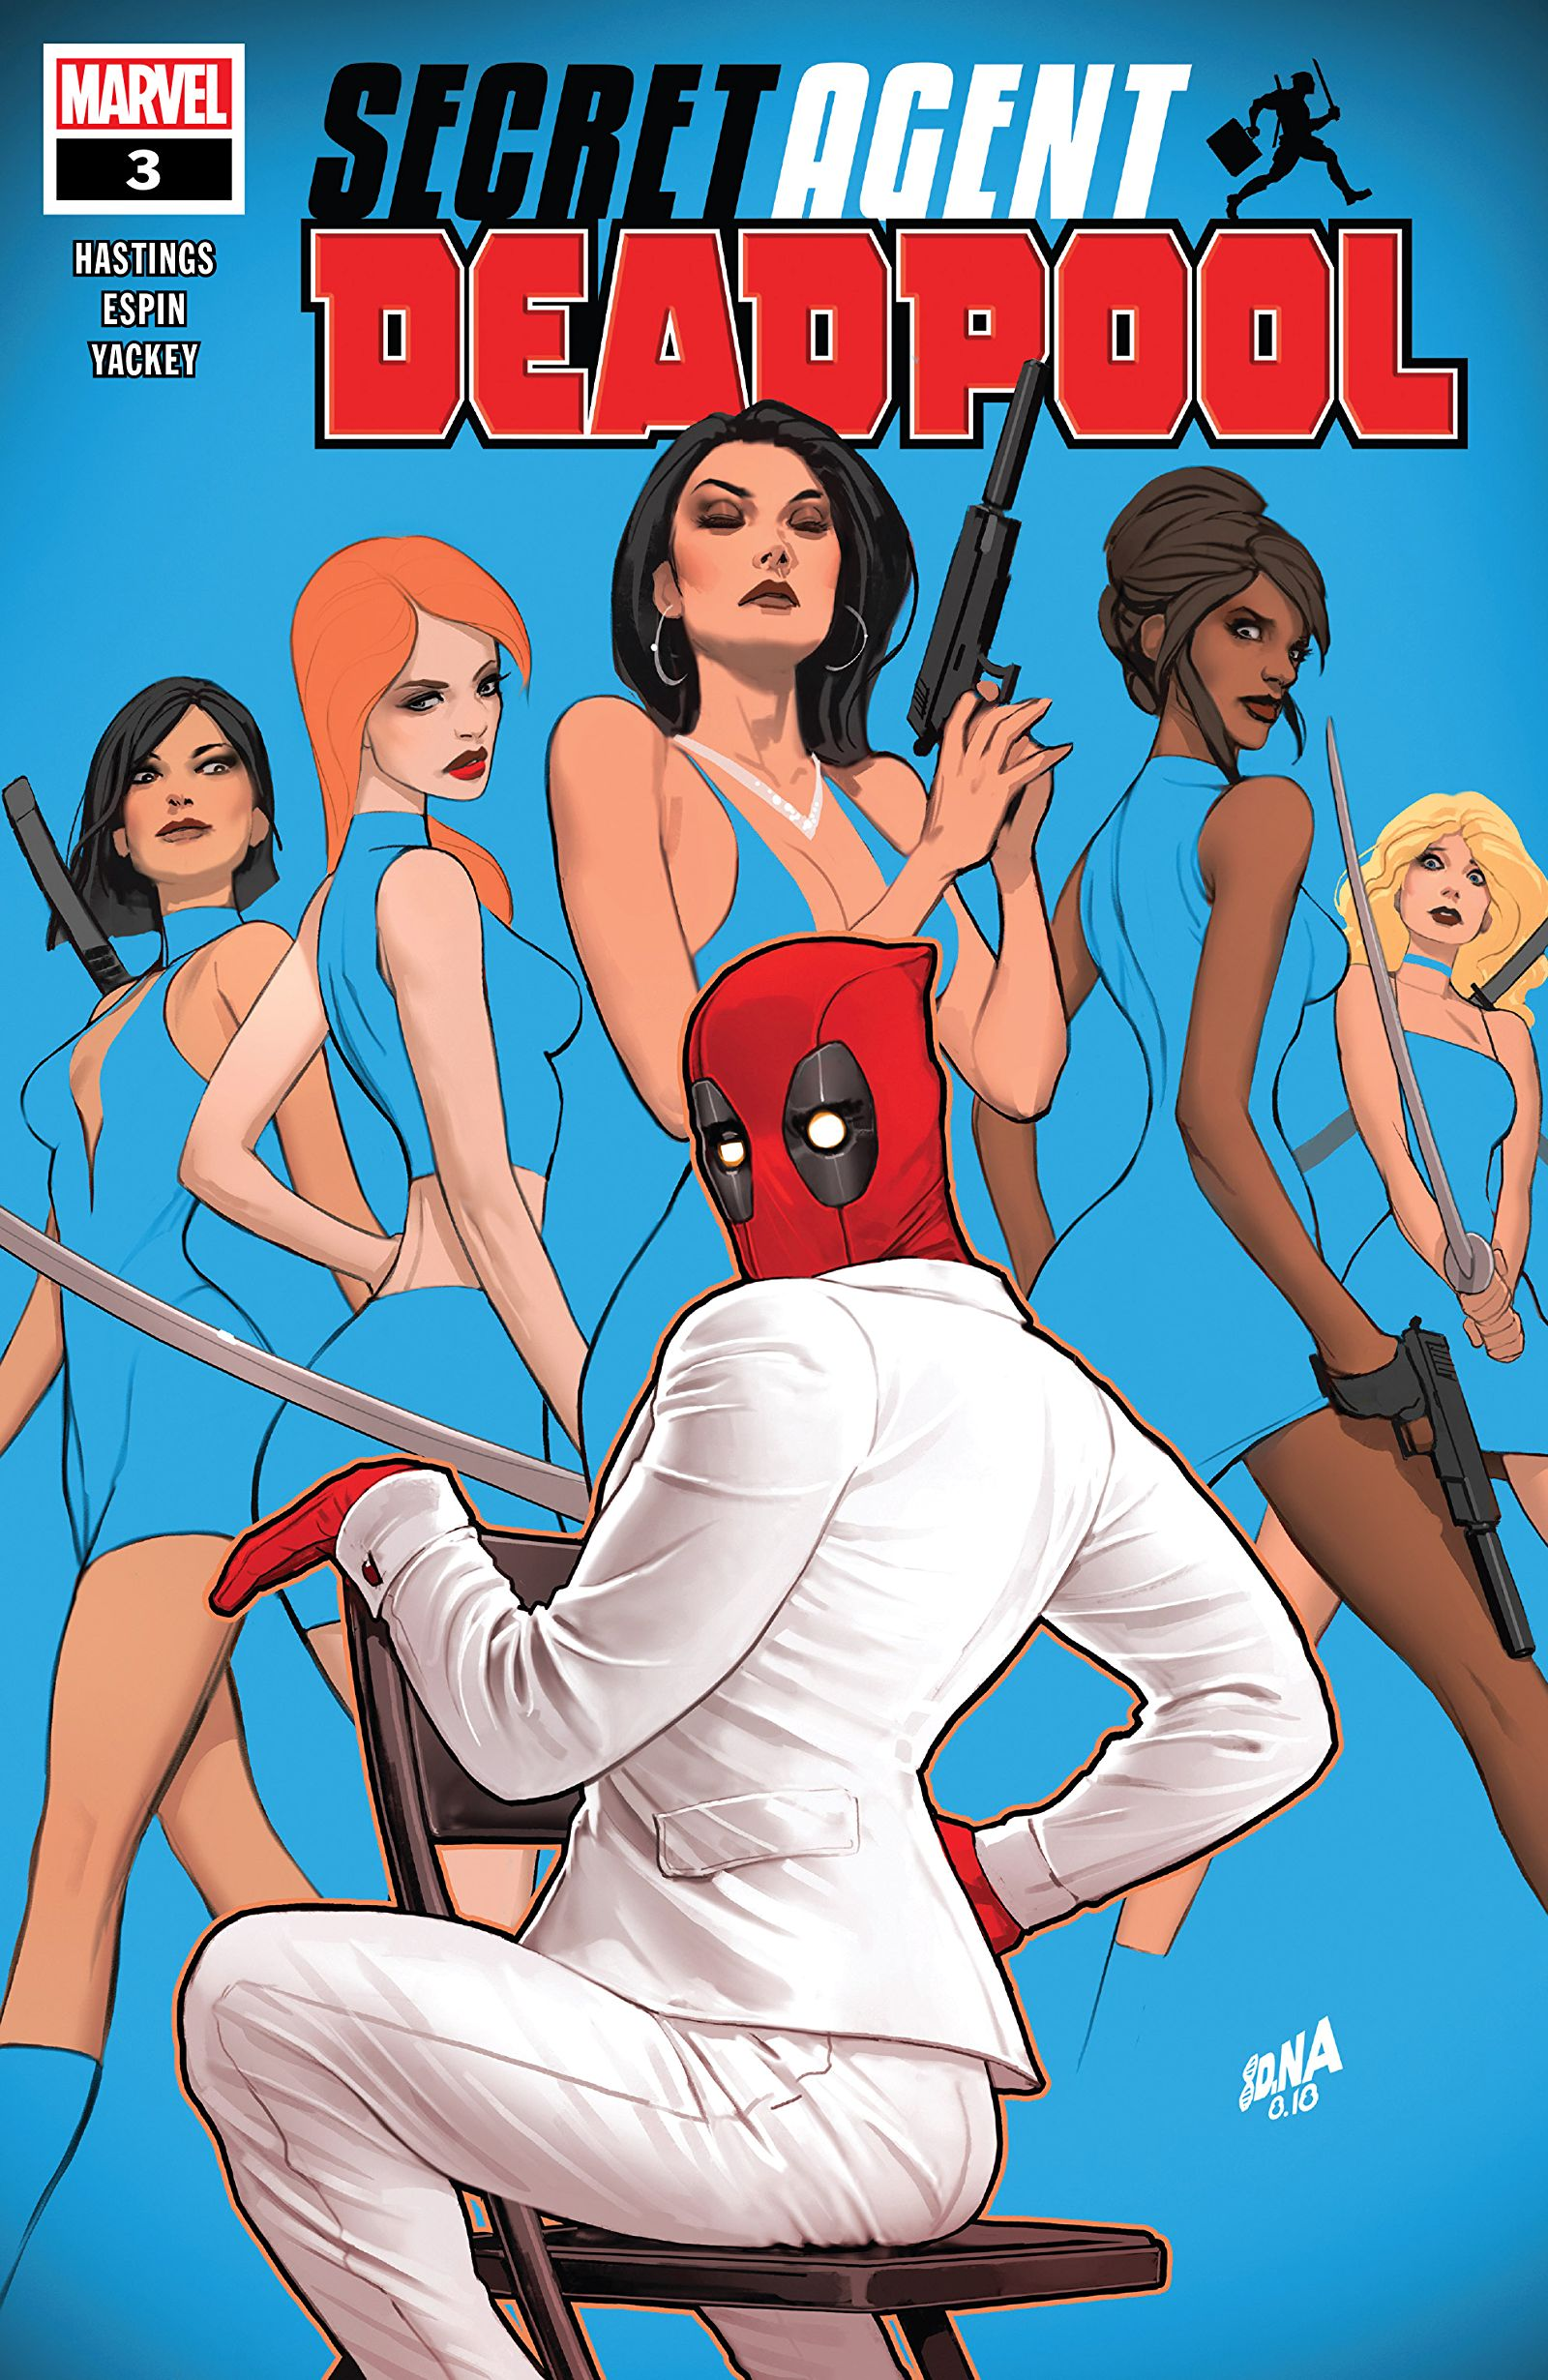 Deadpool: Secret Agent Deadpool Vol 1 3